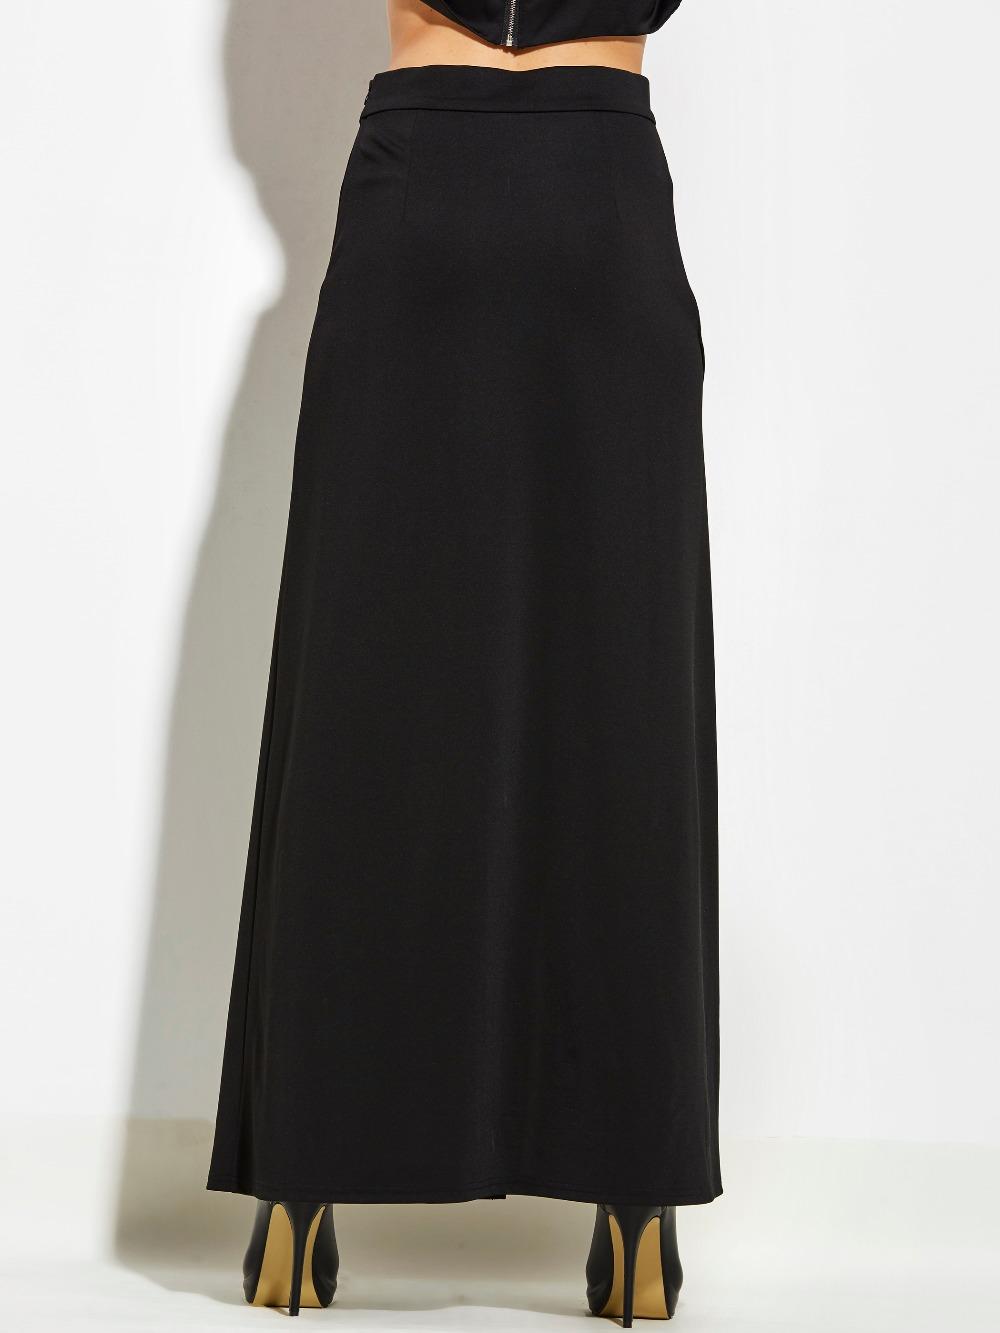 4e158f40db4 Kinikiss XL High Waist Pleat Elegant maxi skirts side split skirt Long  Women Faldas Saia Plus Size Ladies Jupe Black Skirts